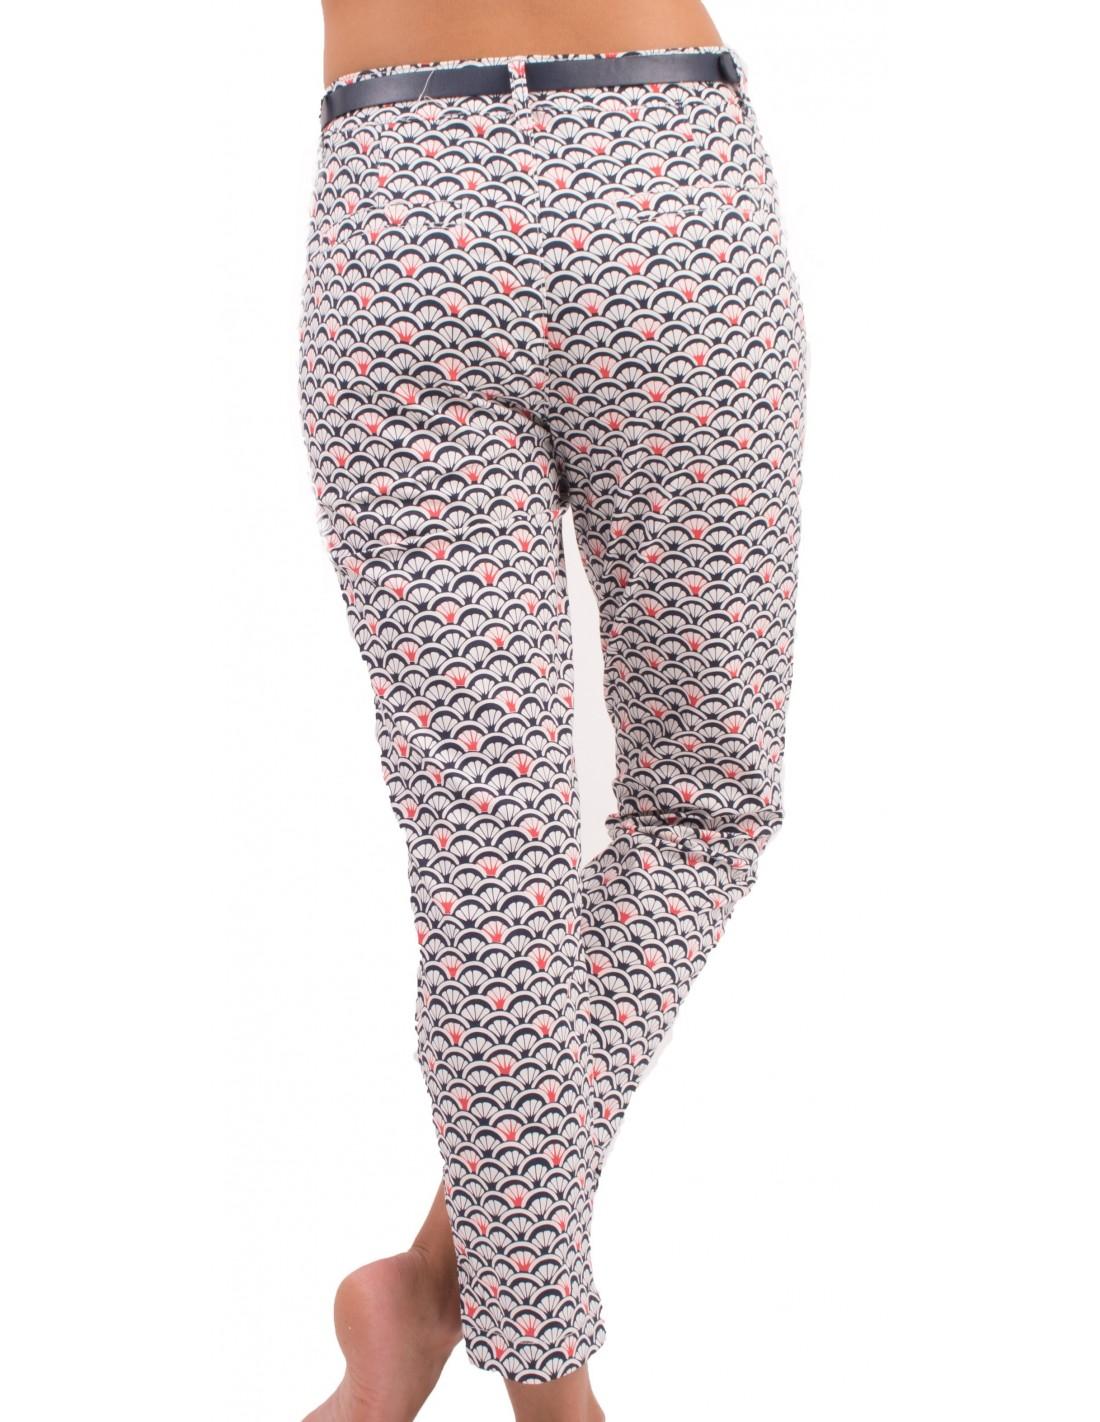 78 Chino Ceinture Femme Rouge Bleuamp; Pantalon Motif Avec Coquillage nw80OkP